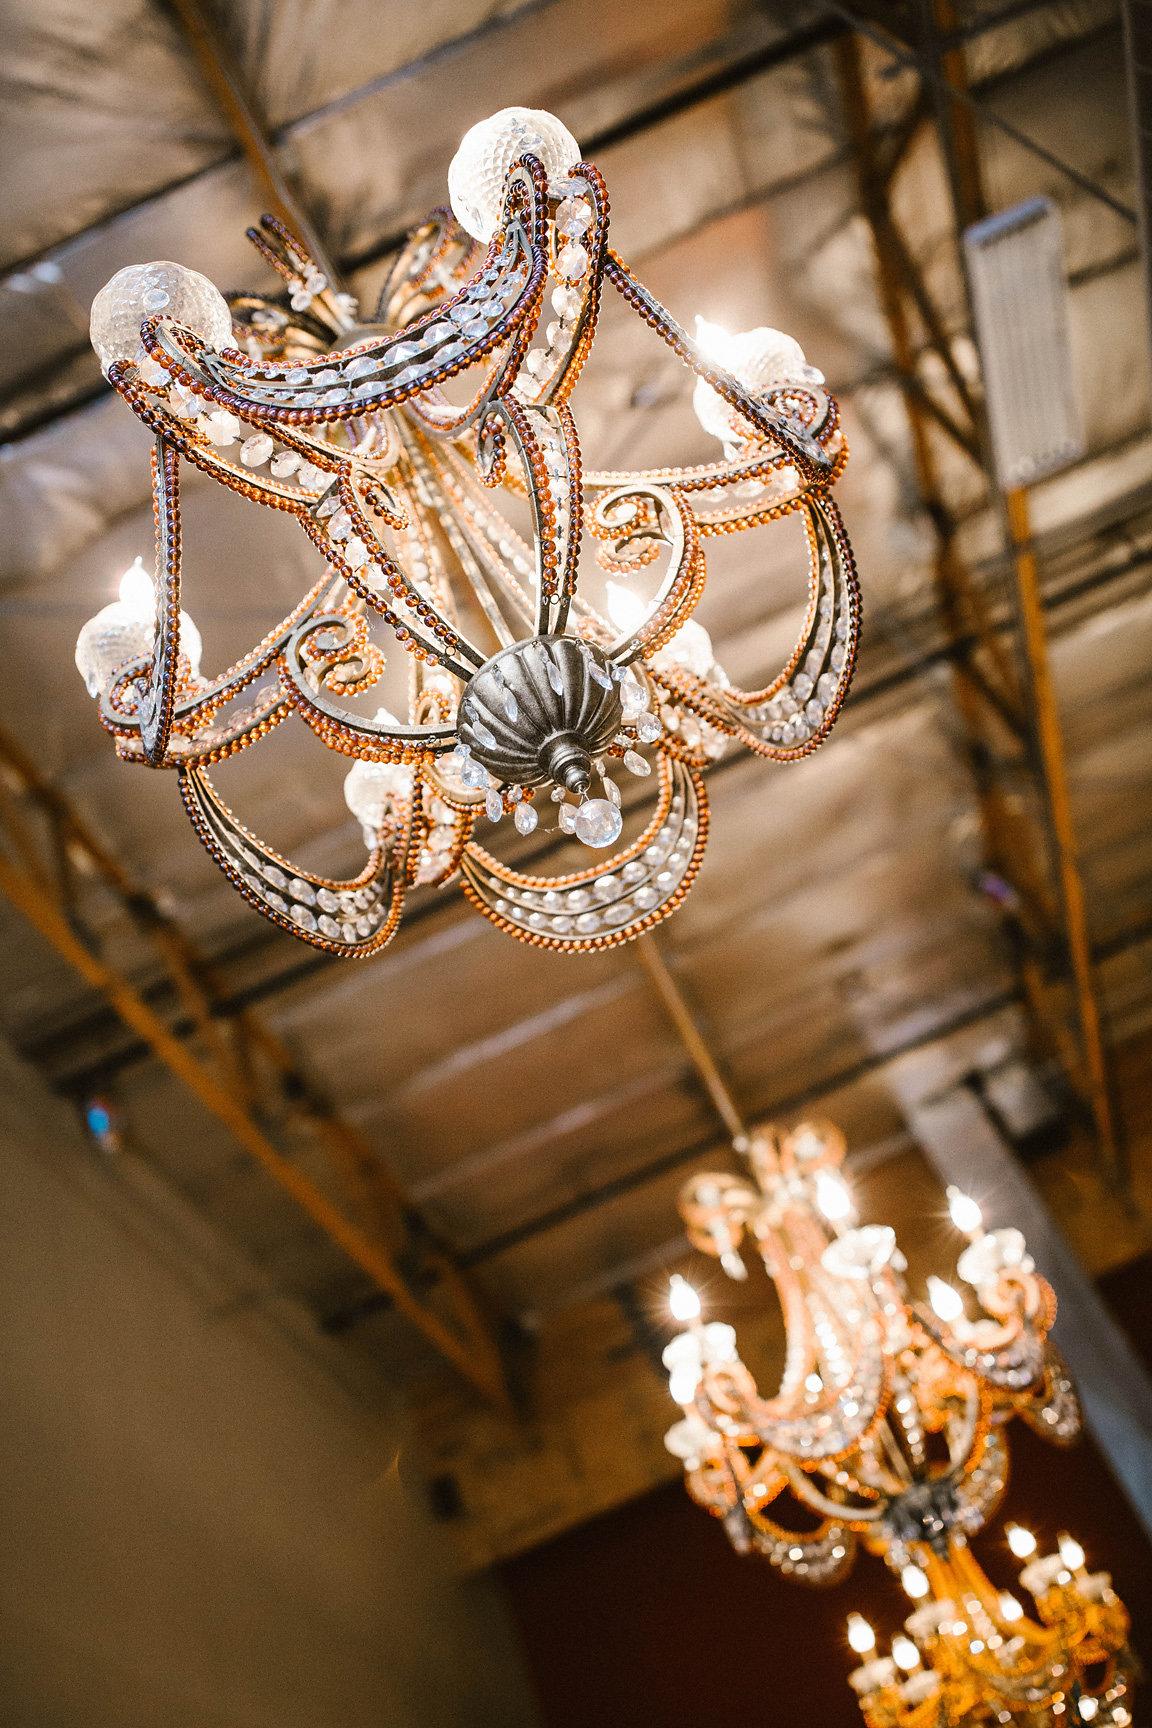 the-woodhouse-winery-woodinville-seattle-wedding-venues-Seattle-photographer-adina-preston-weddings-in-woodinville-2017-1.jpg